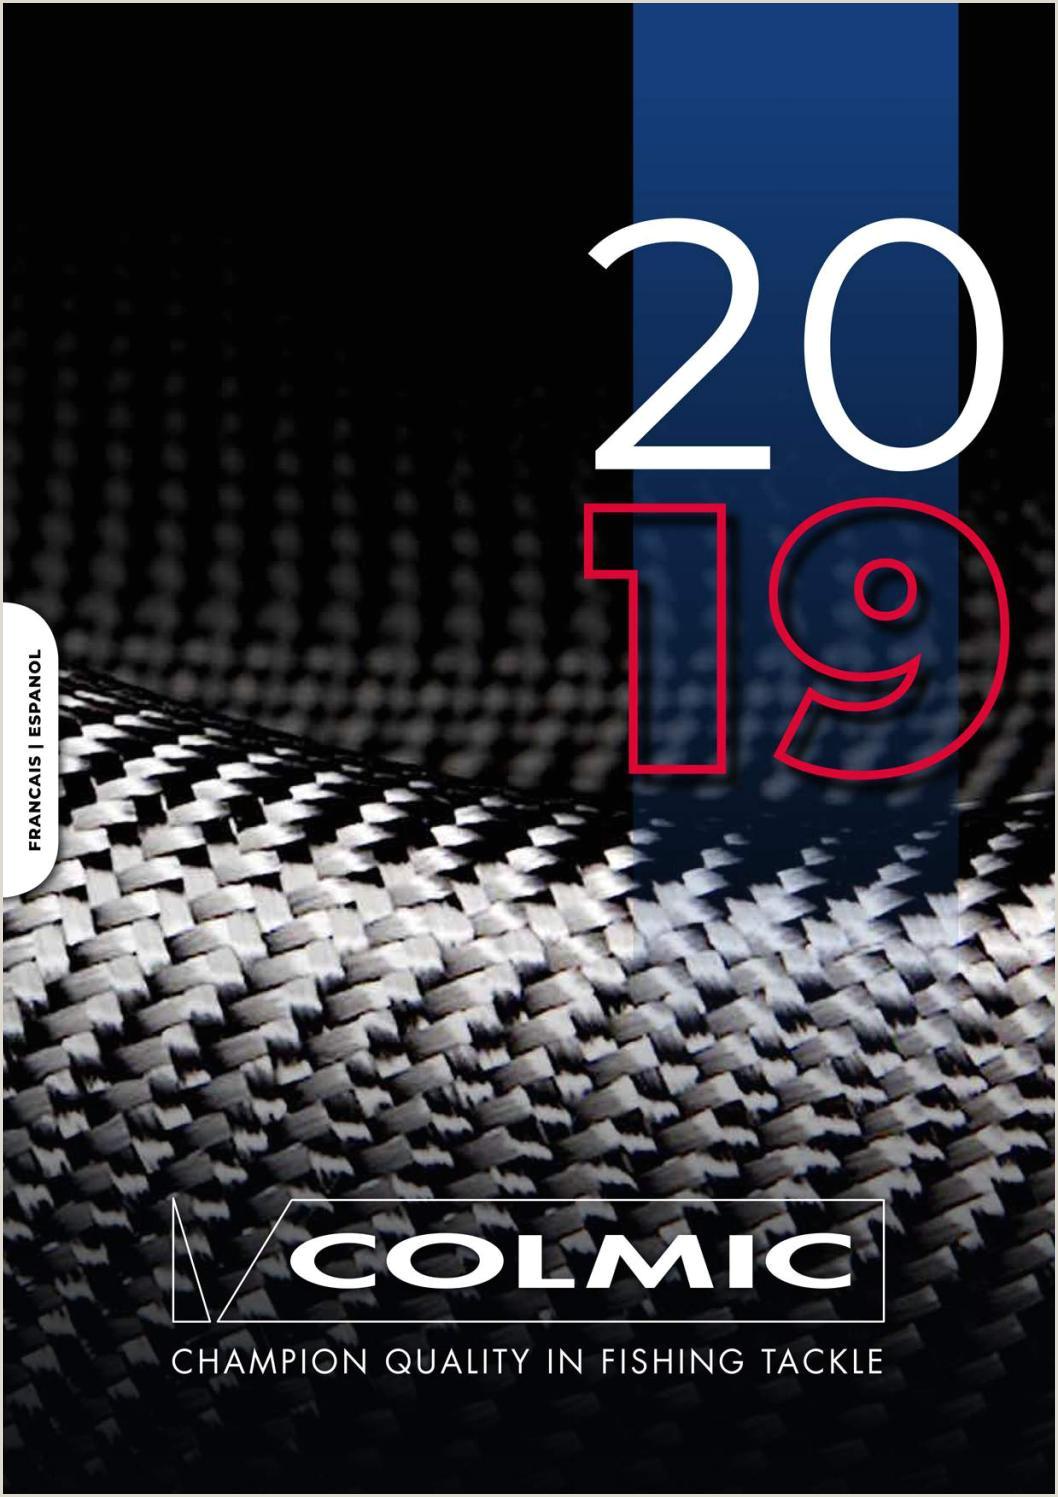 Descargar Hoja De Vida Clasica Colmic2019 Fraspa by Colmic issuu